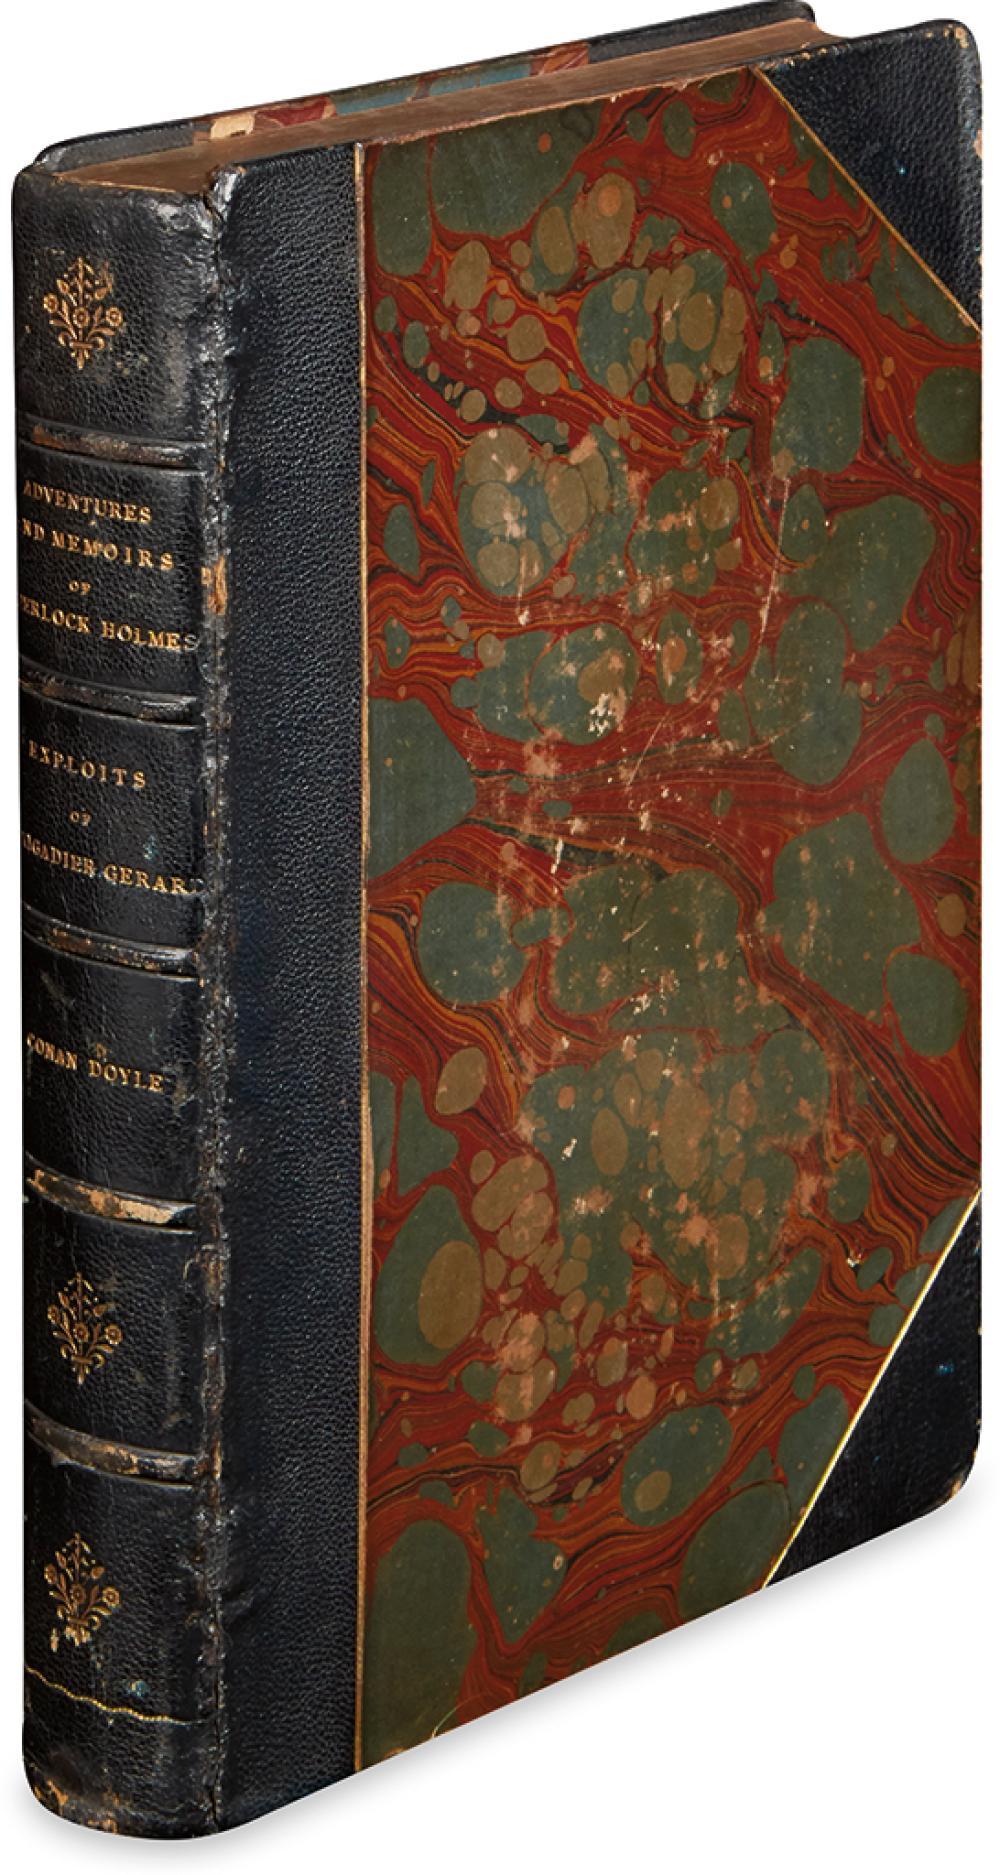 DOYLE, ARTHUR CONAN. Adventures of Sherlock Holmes * Memoirs of Sherlock Holmes * Exploits of Brigadier Gerard.